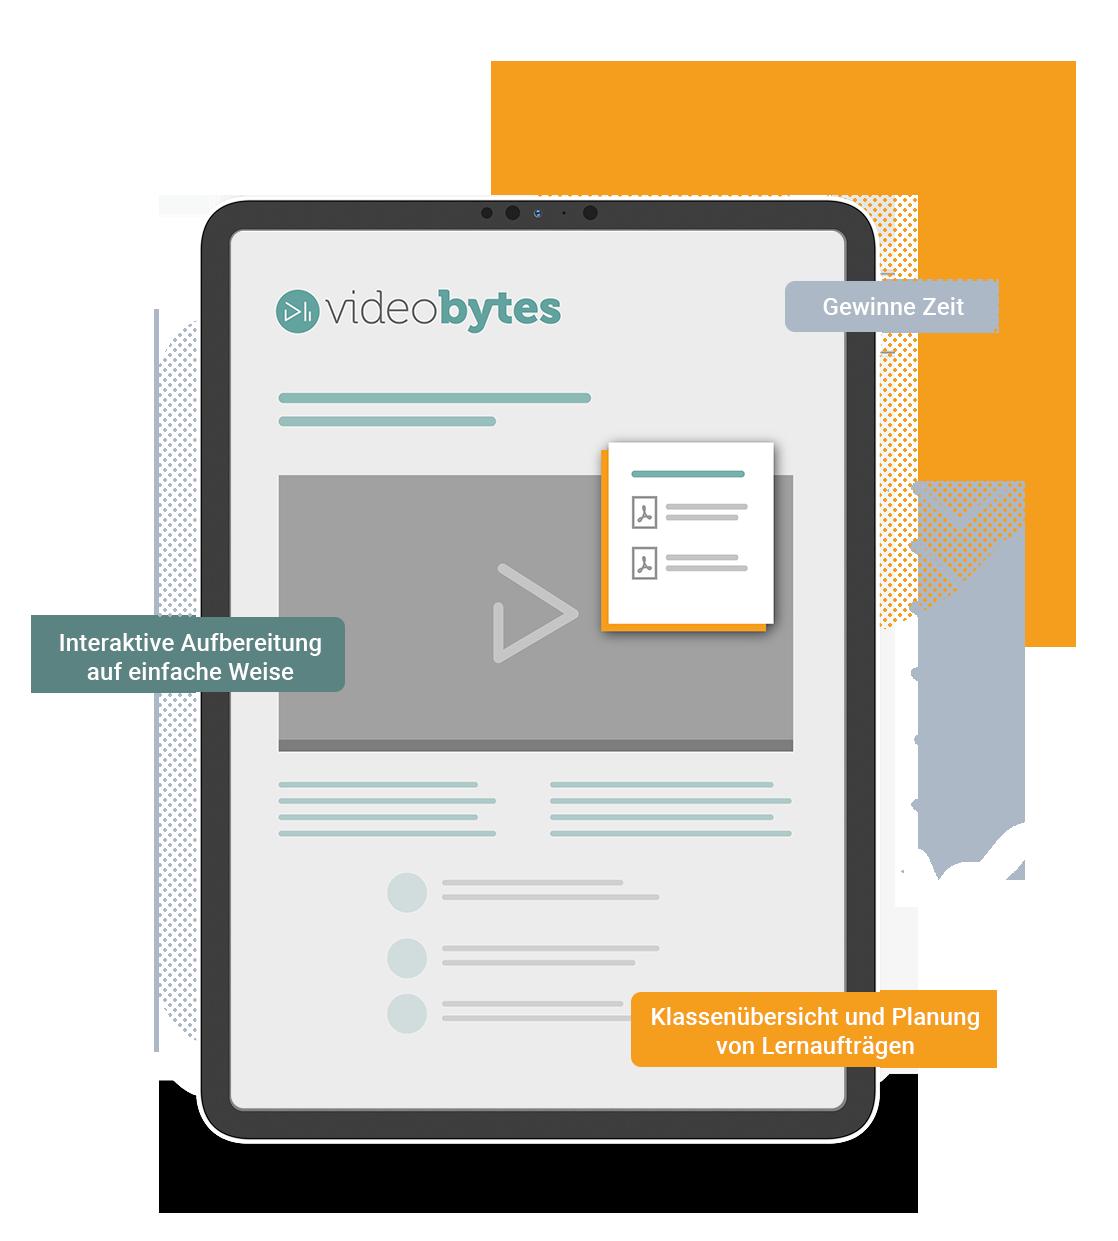 VideoBytes_Schule_Vorteile_Funktionen_Tool_Distance-Learning_Digitale-Schule_2